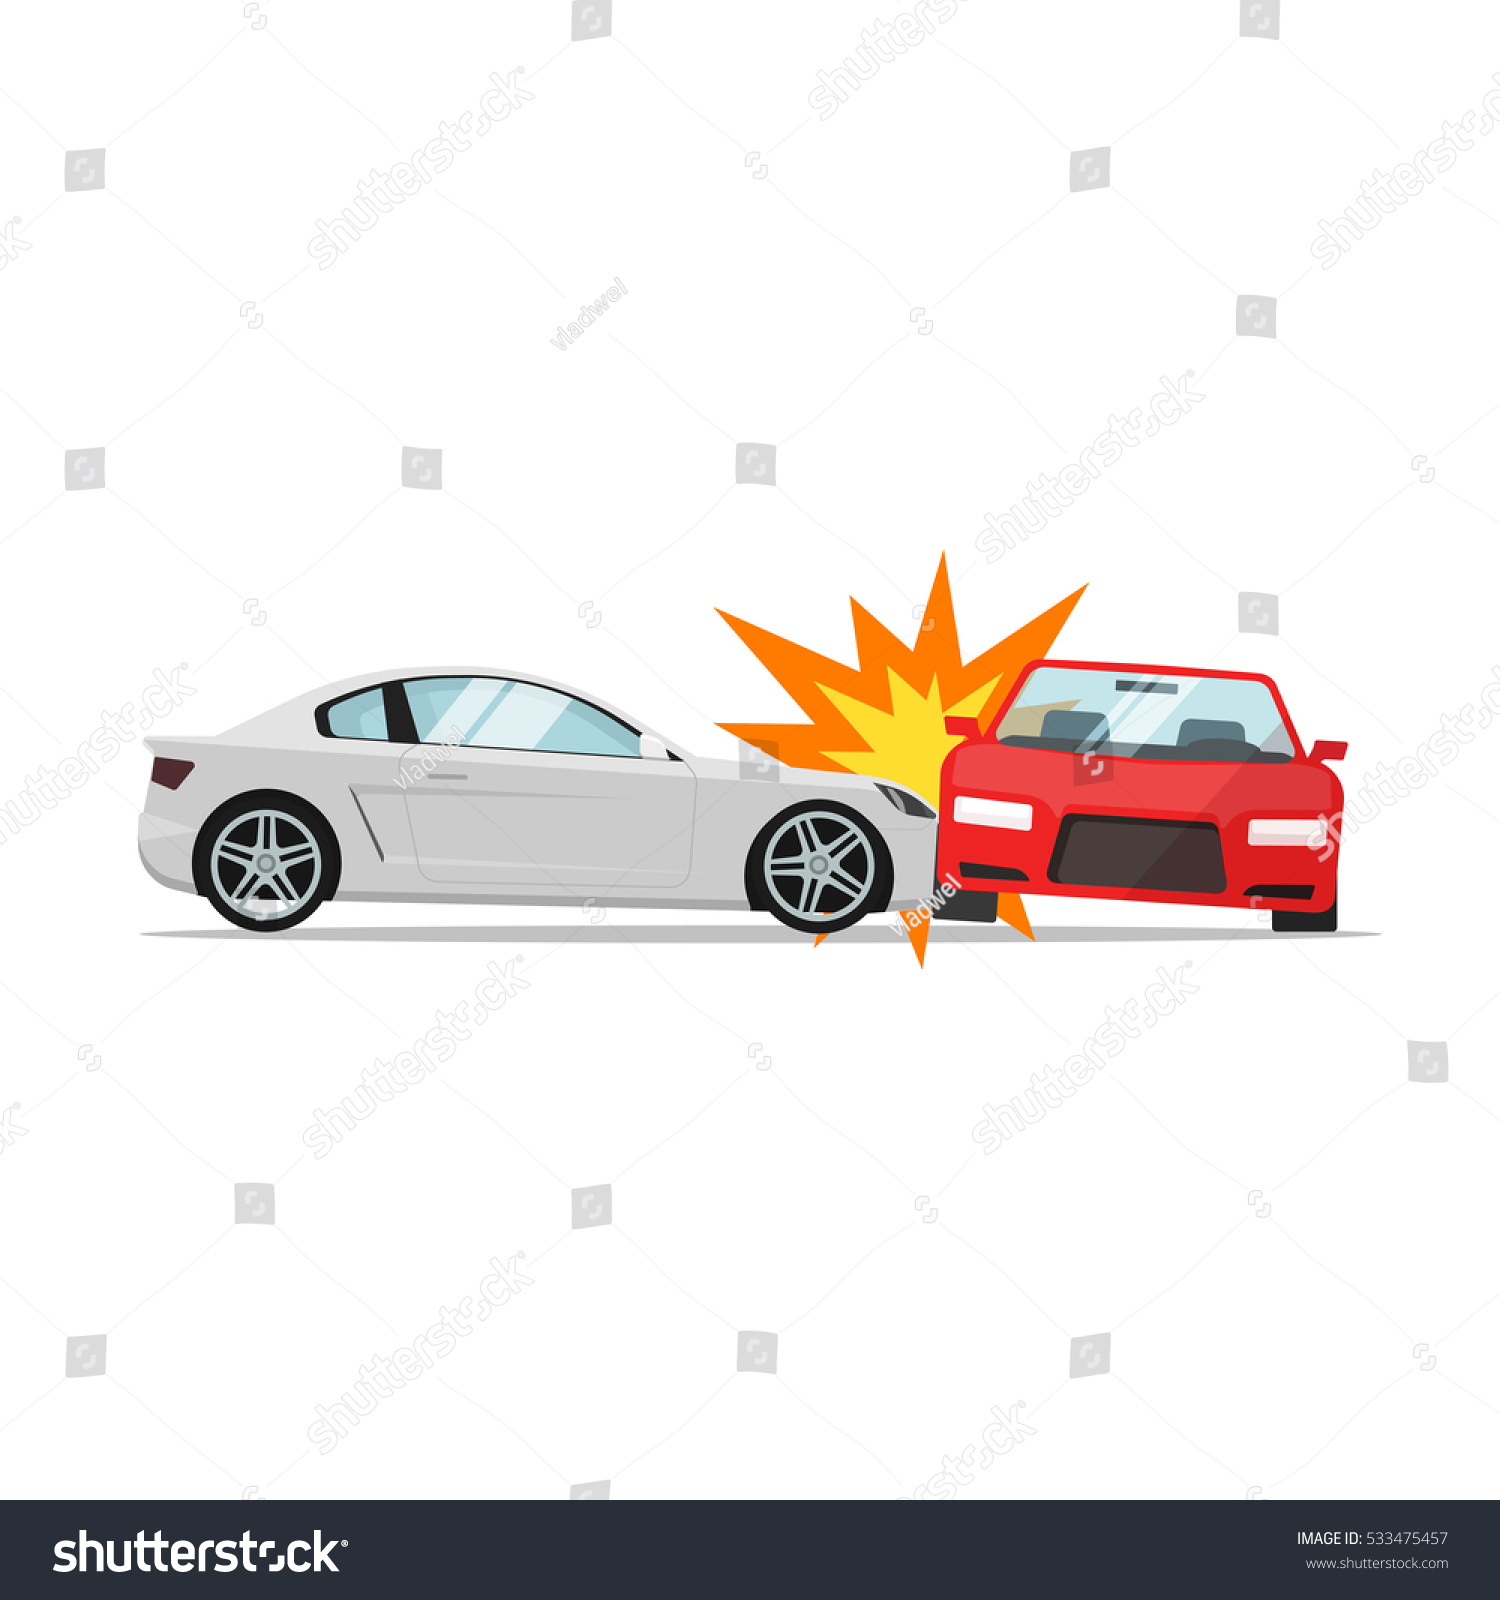 Car Crash Vector Illustration Flat Cartoon Stock Vector 533475457 ...